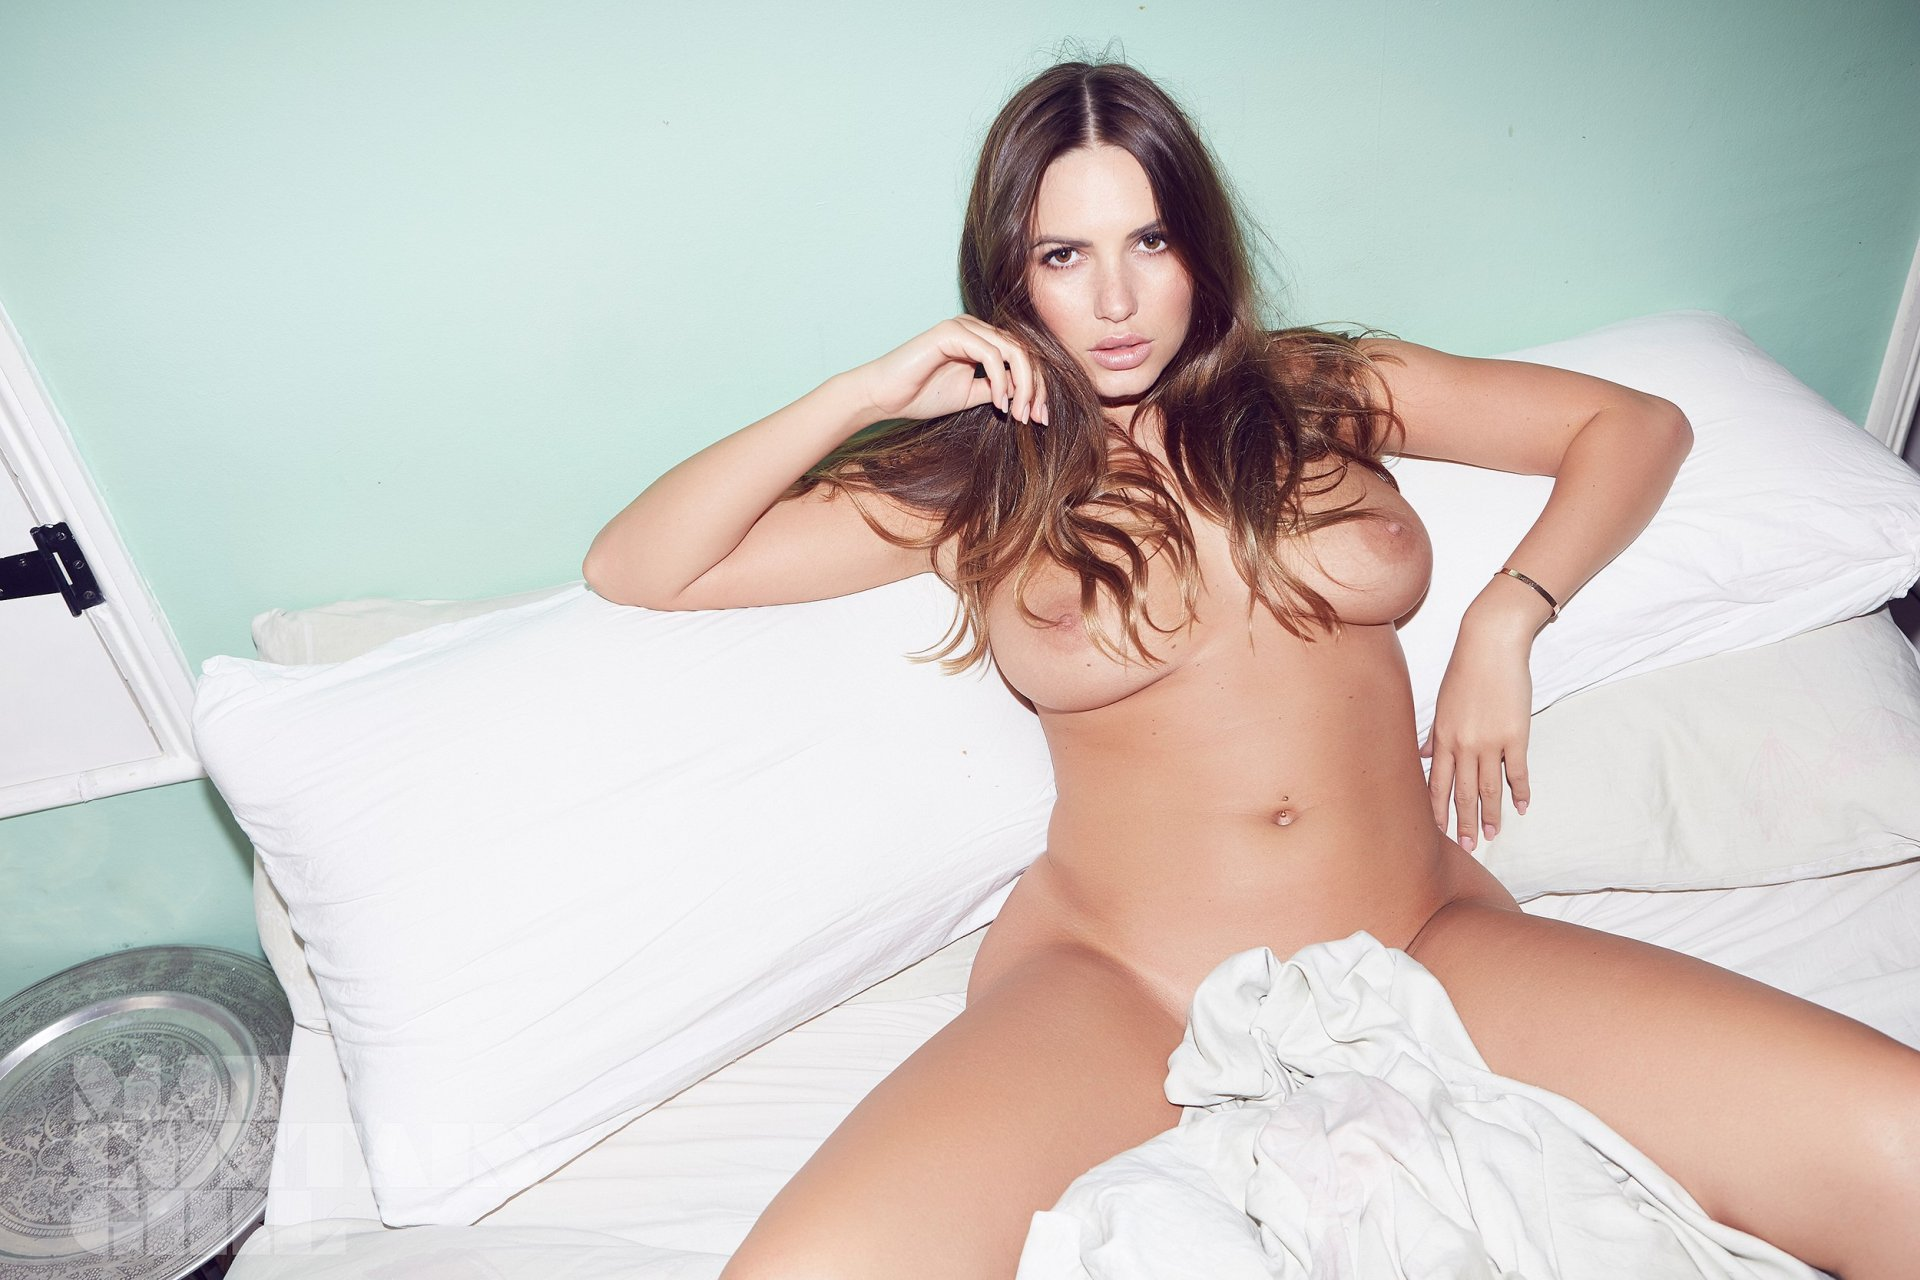 nudes (75 photos), Is a cute Celebrites photo